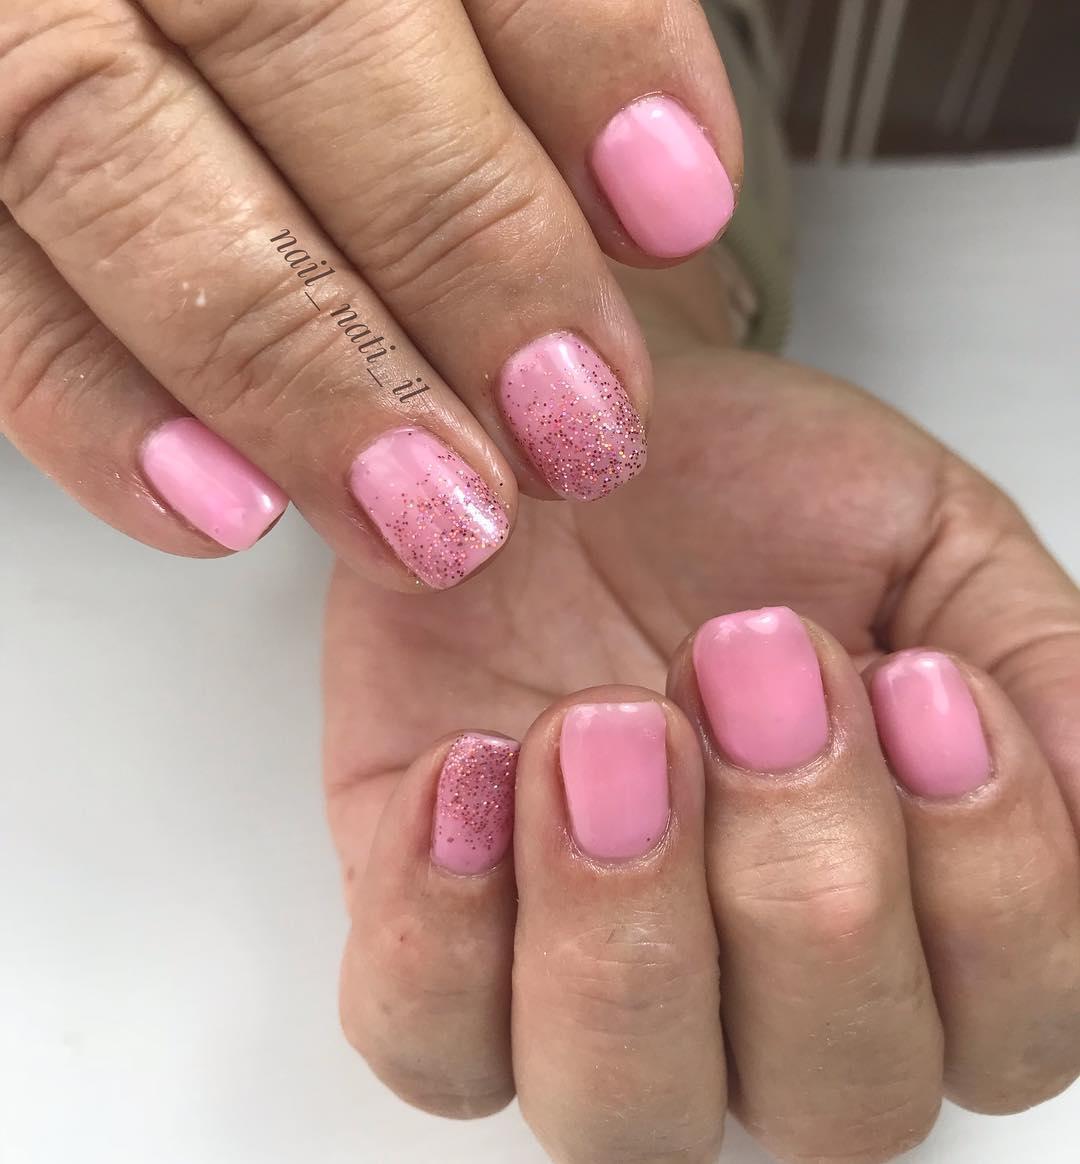 simple flower nail design ideas 2019 - 24 Simple Flower Nail Design Ideas 2019